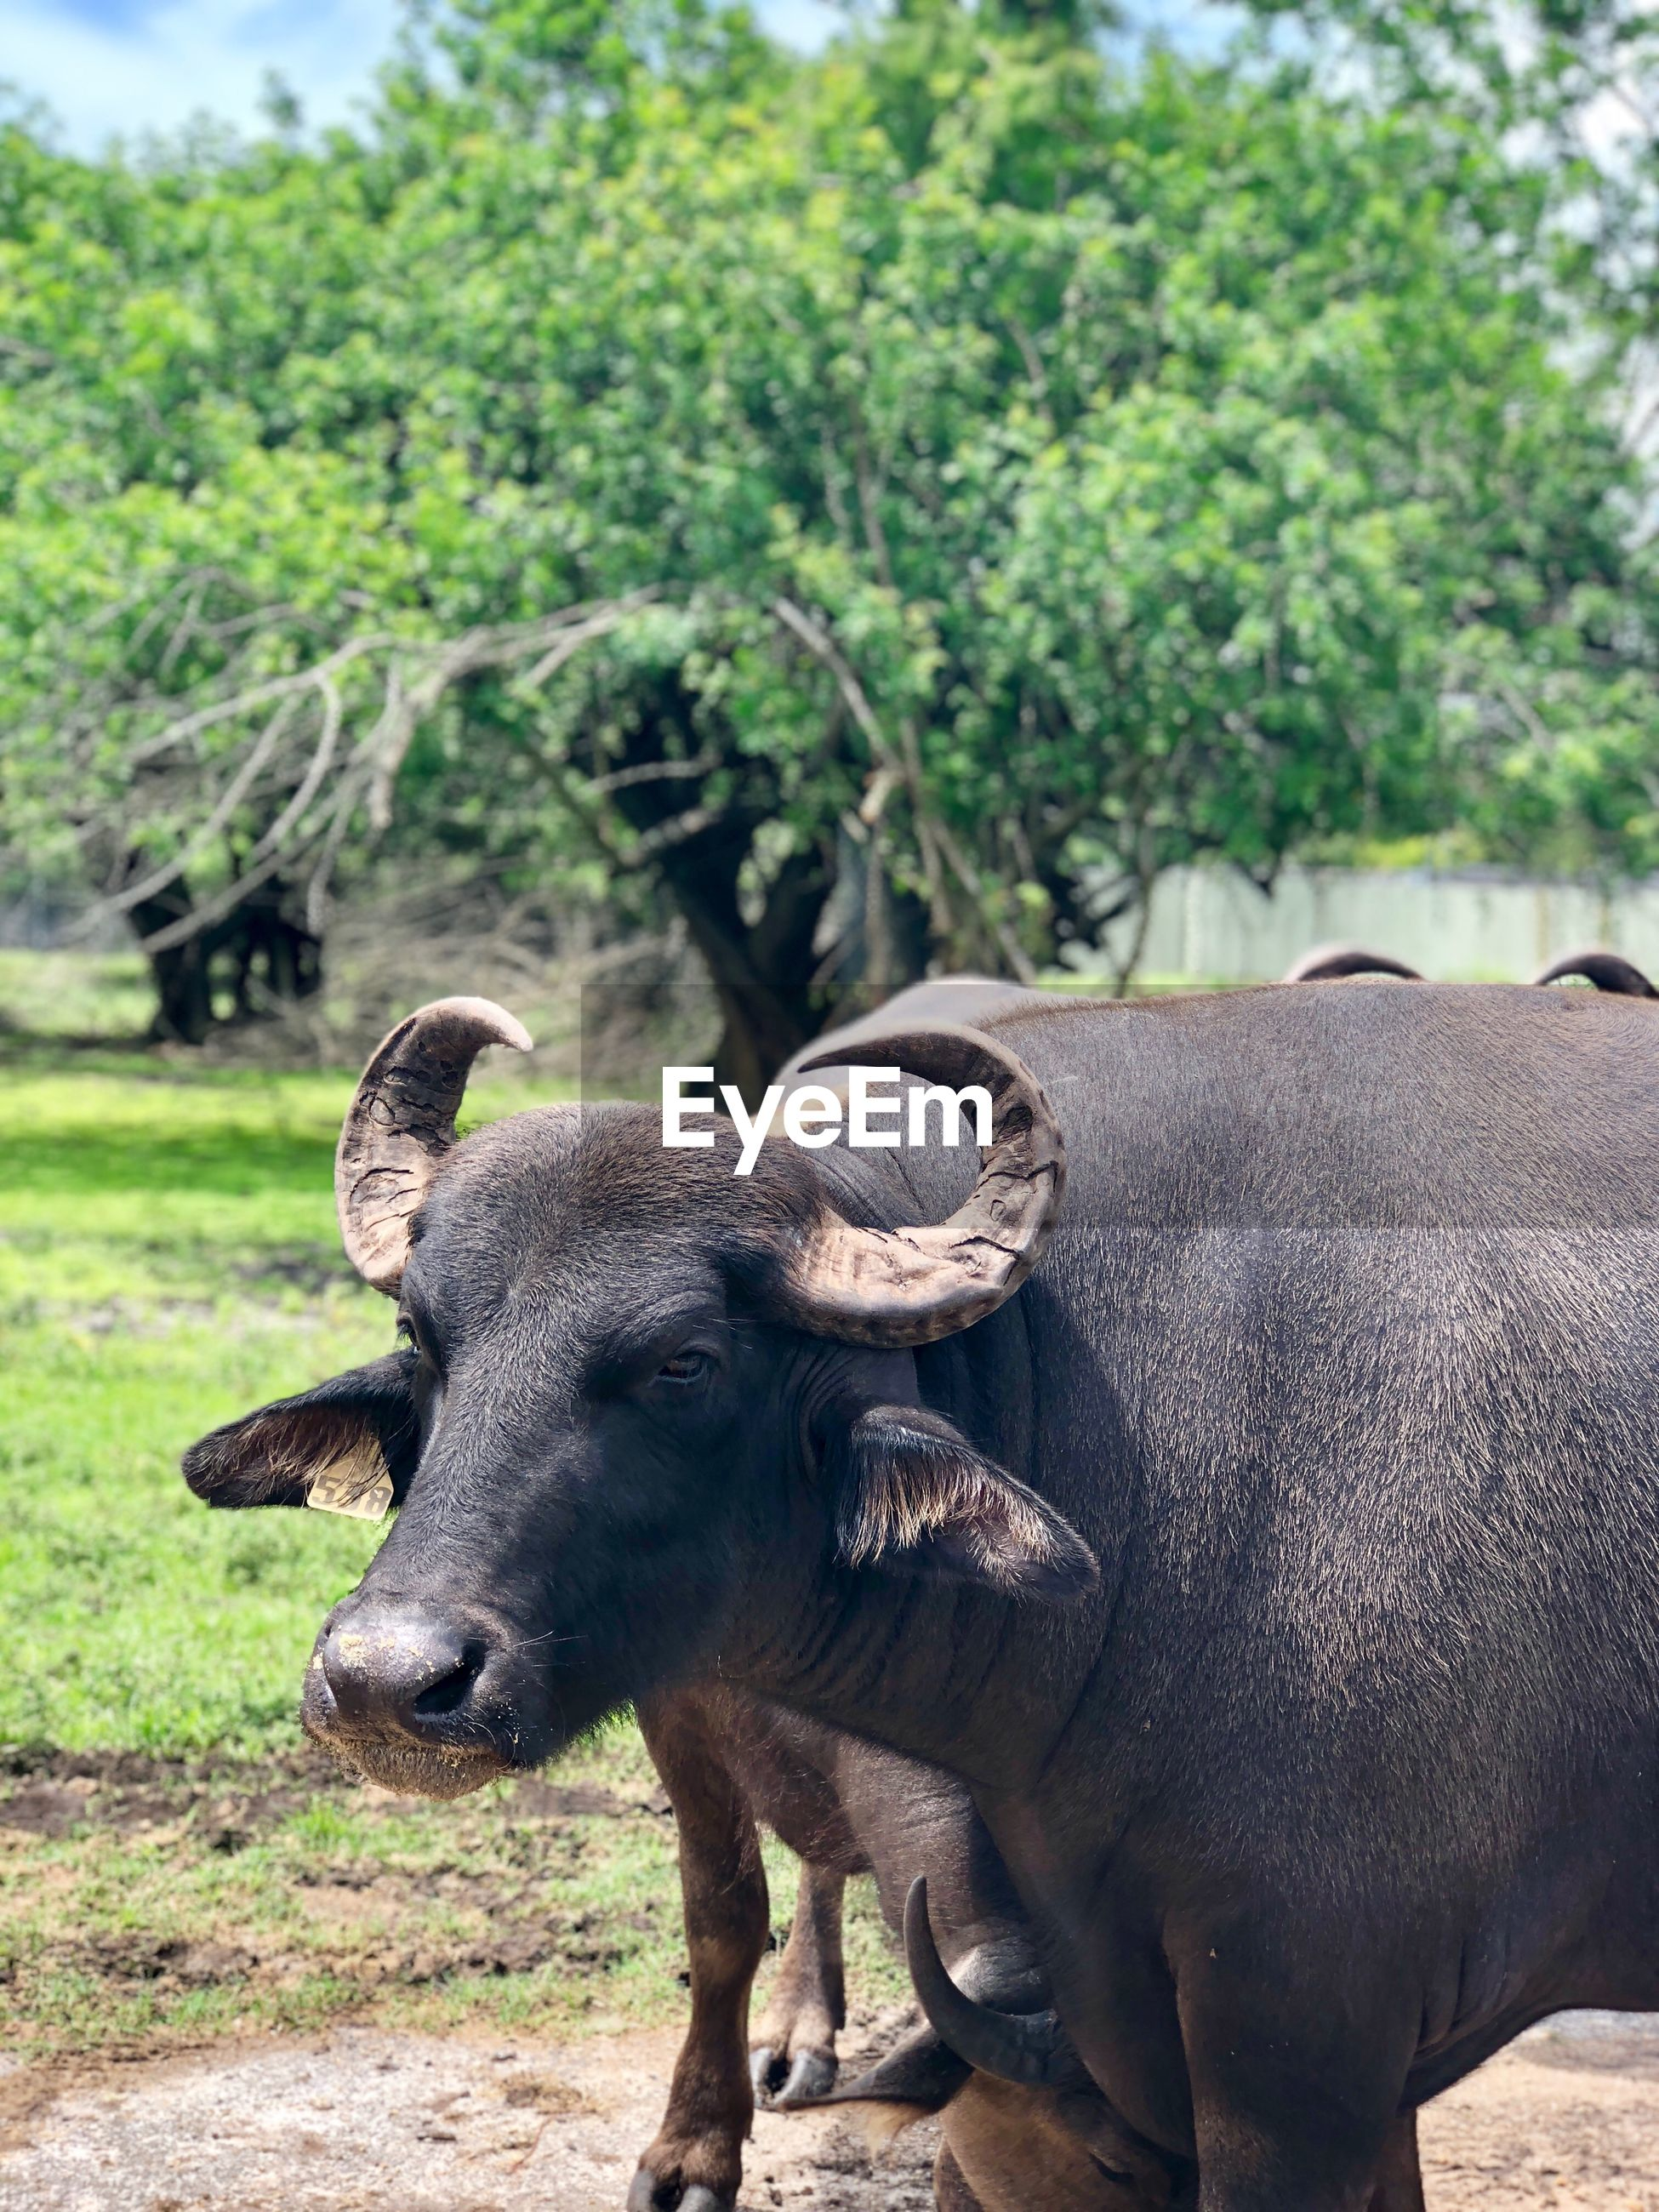 Buffalo standing outdoors